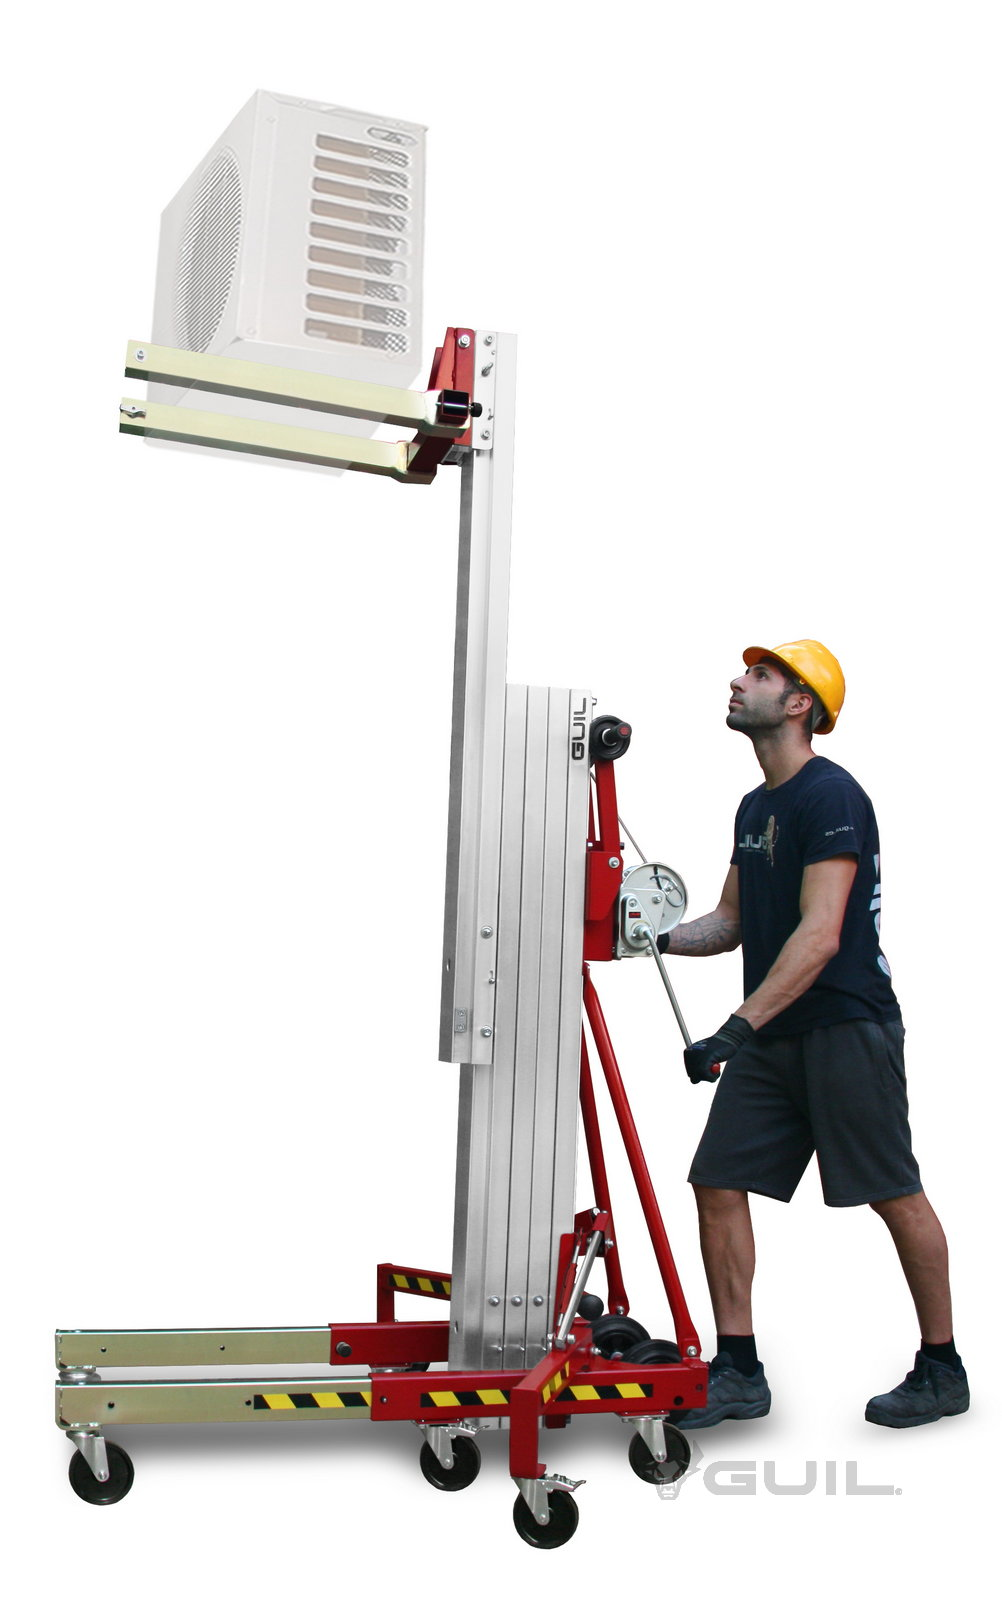 Kanaallift 6,60 m 230 kg (dutch) (8)